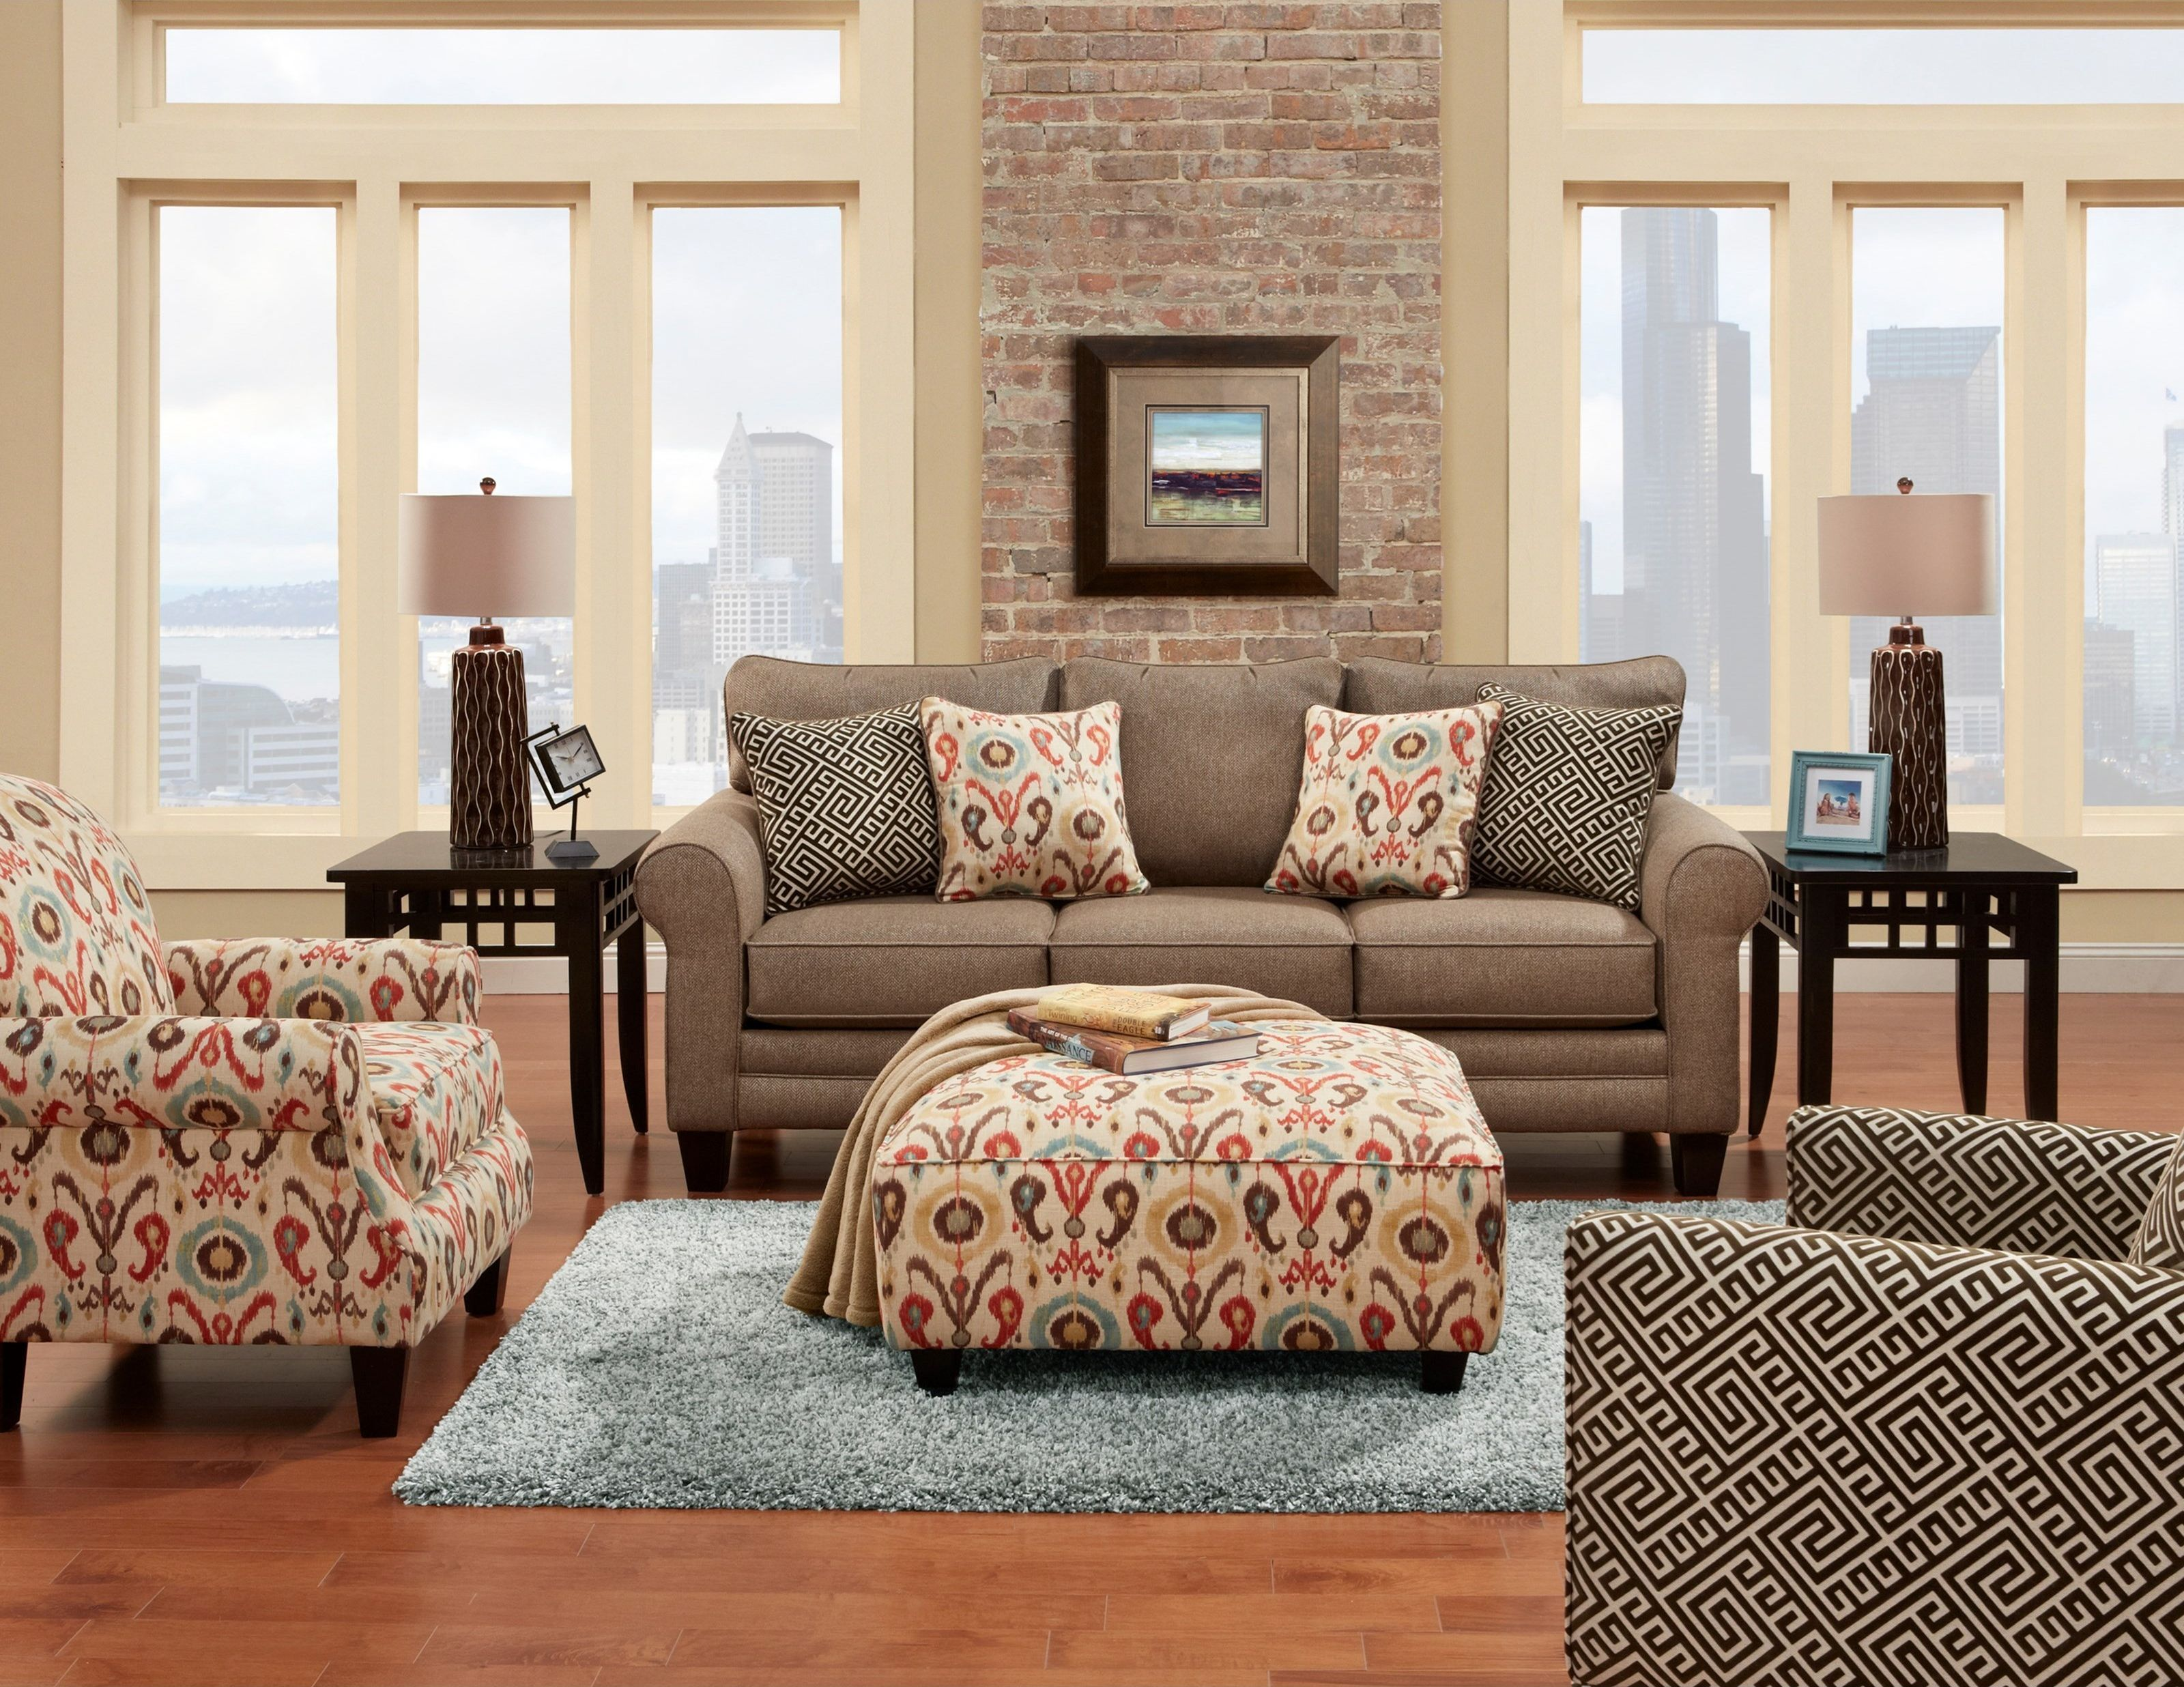 Swell Romero Badger Sofa And Love Seat 899 00 Sofa 499 00 98 X Cjindustries Chair Design For Home Cjindustriesco